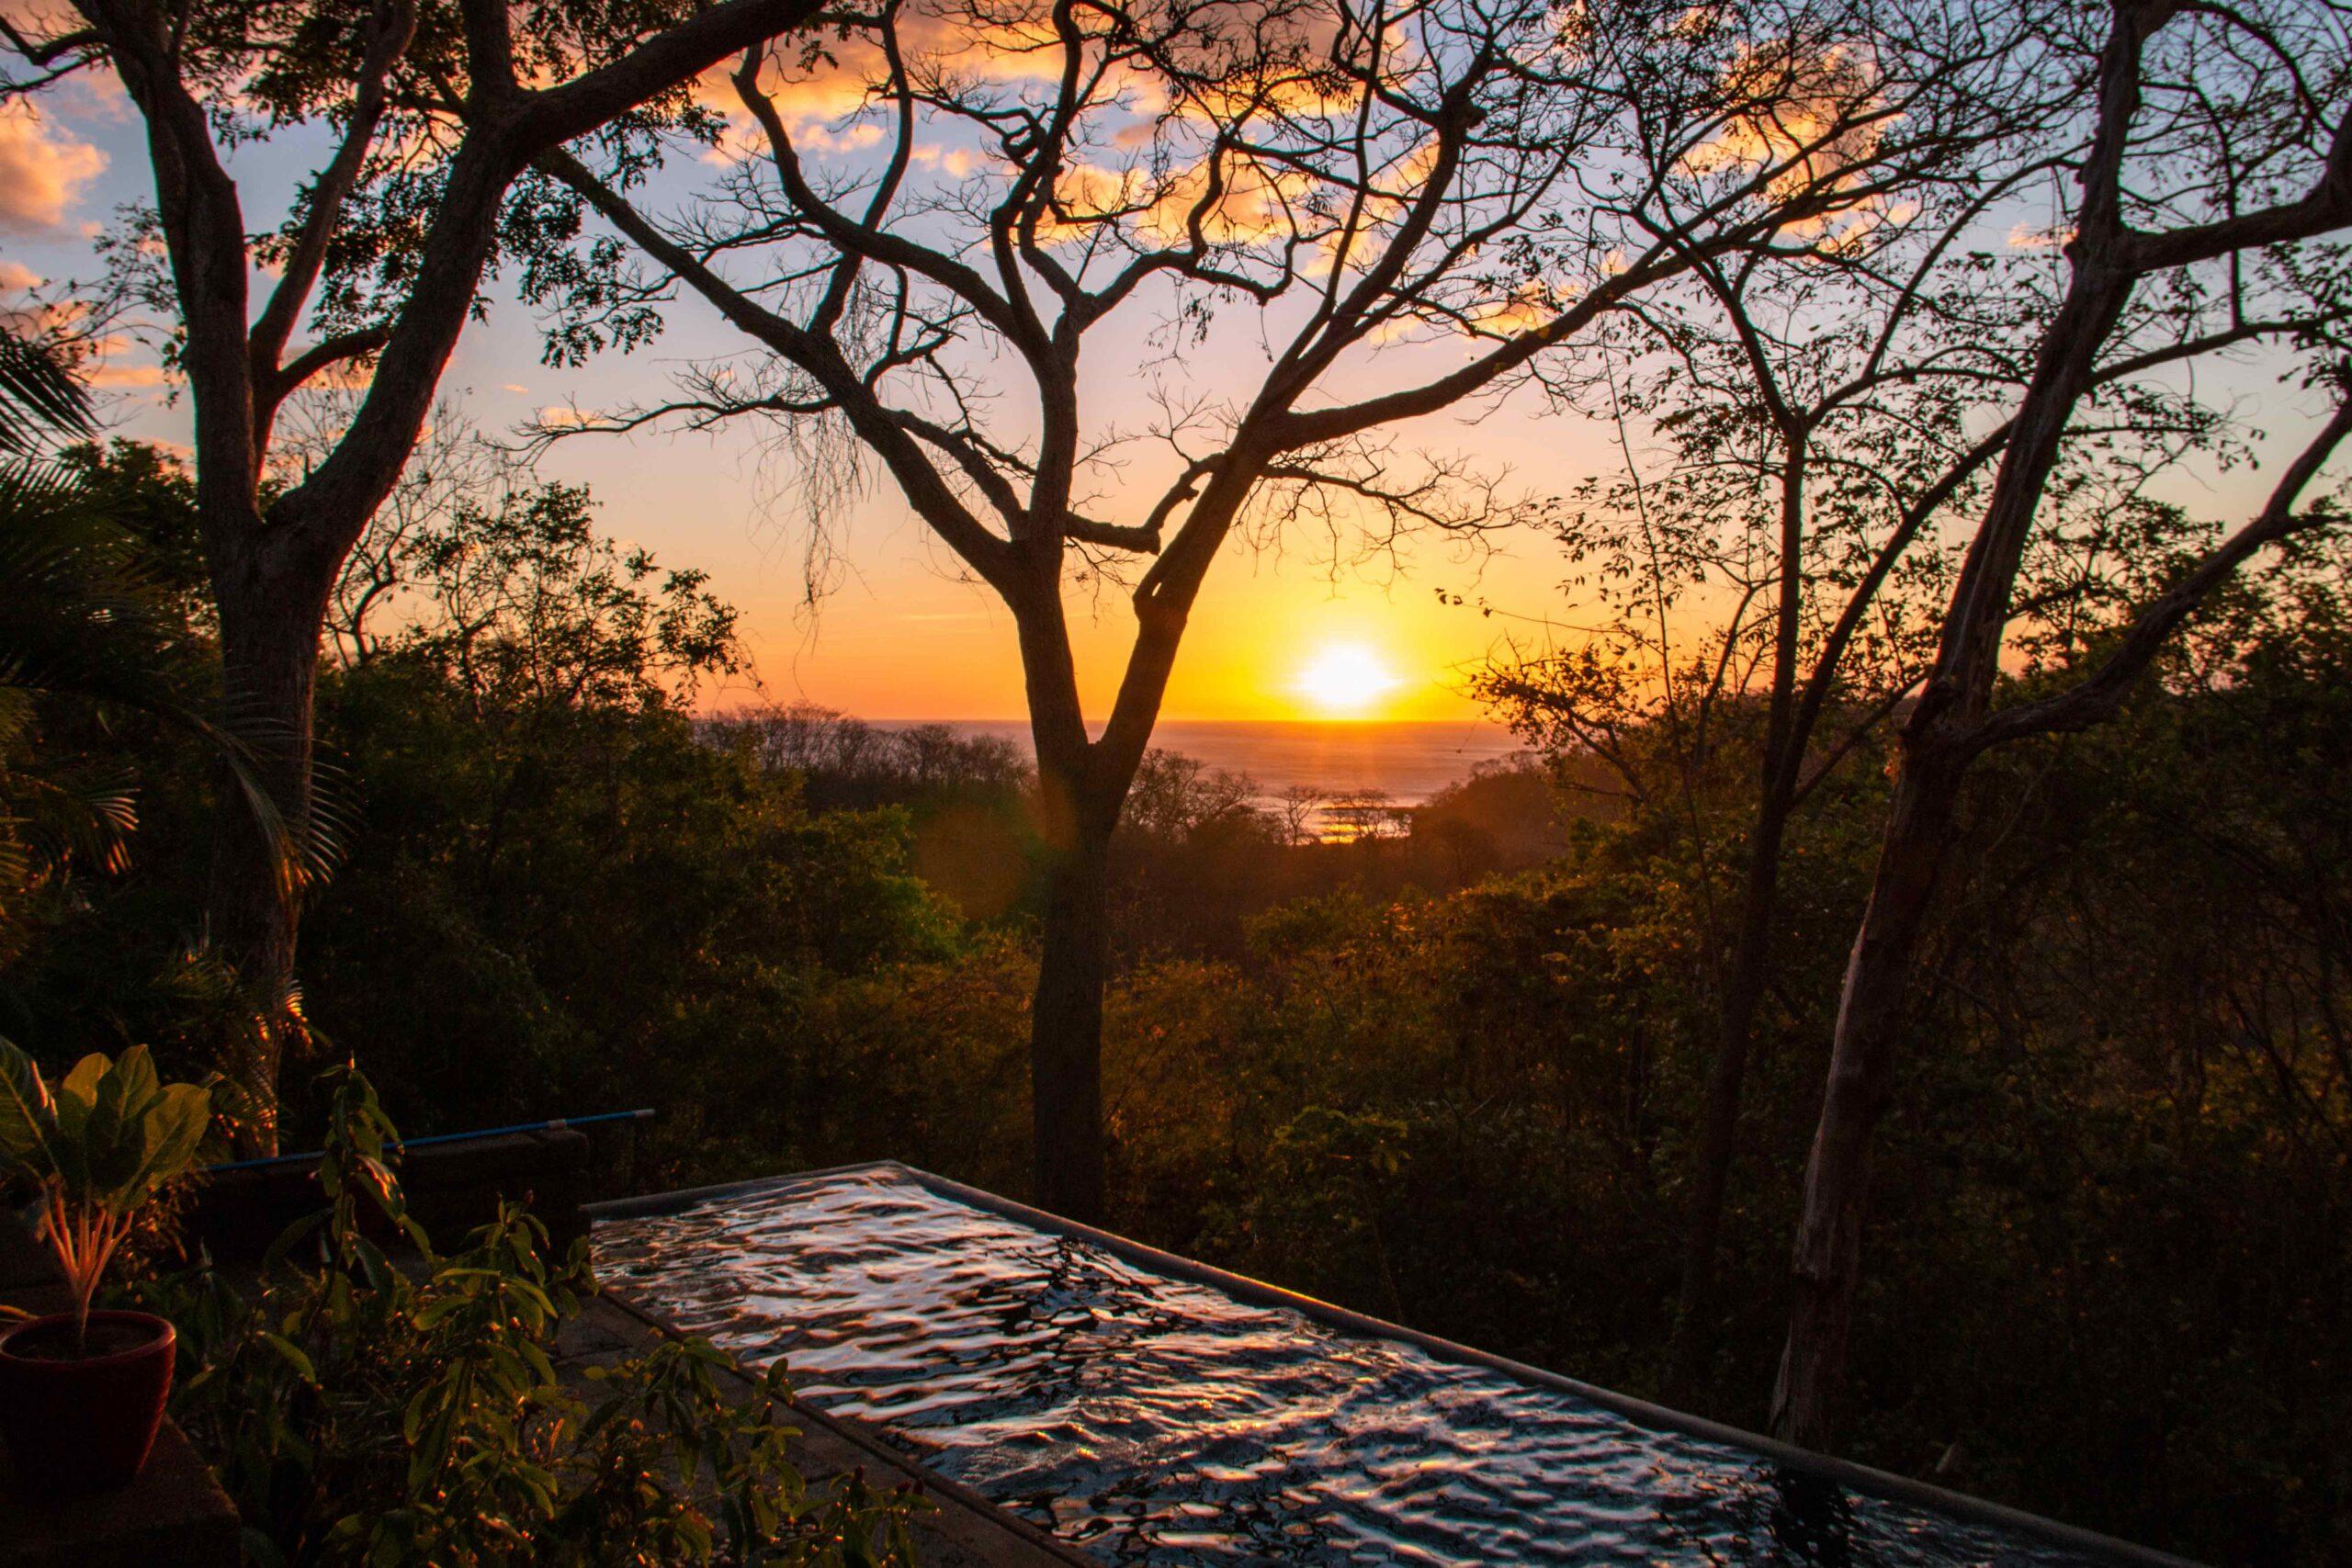 Sunset view from the infinity pool at Balcones de Majagual in Nicaragua